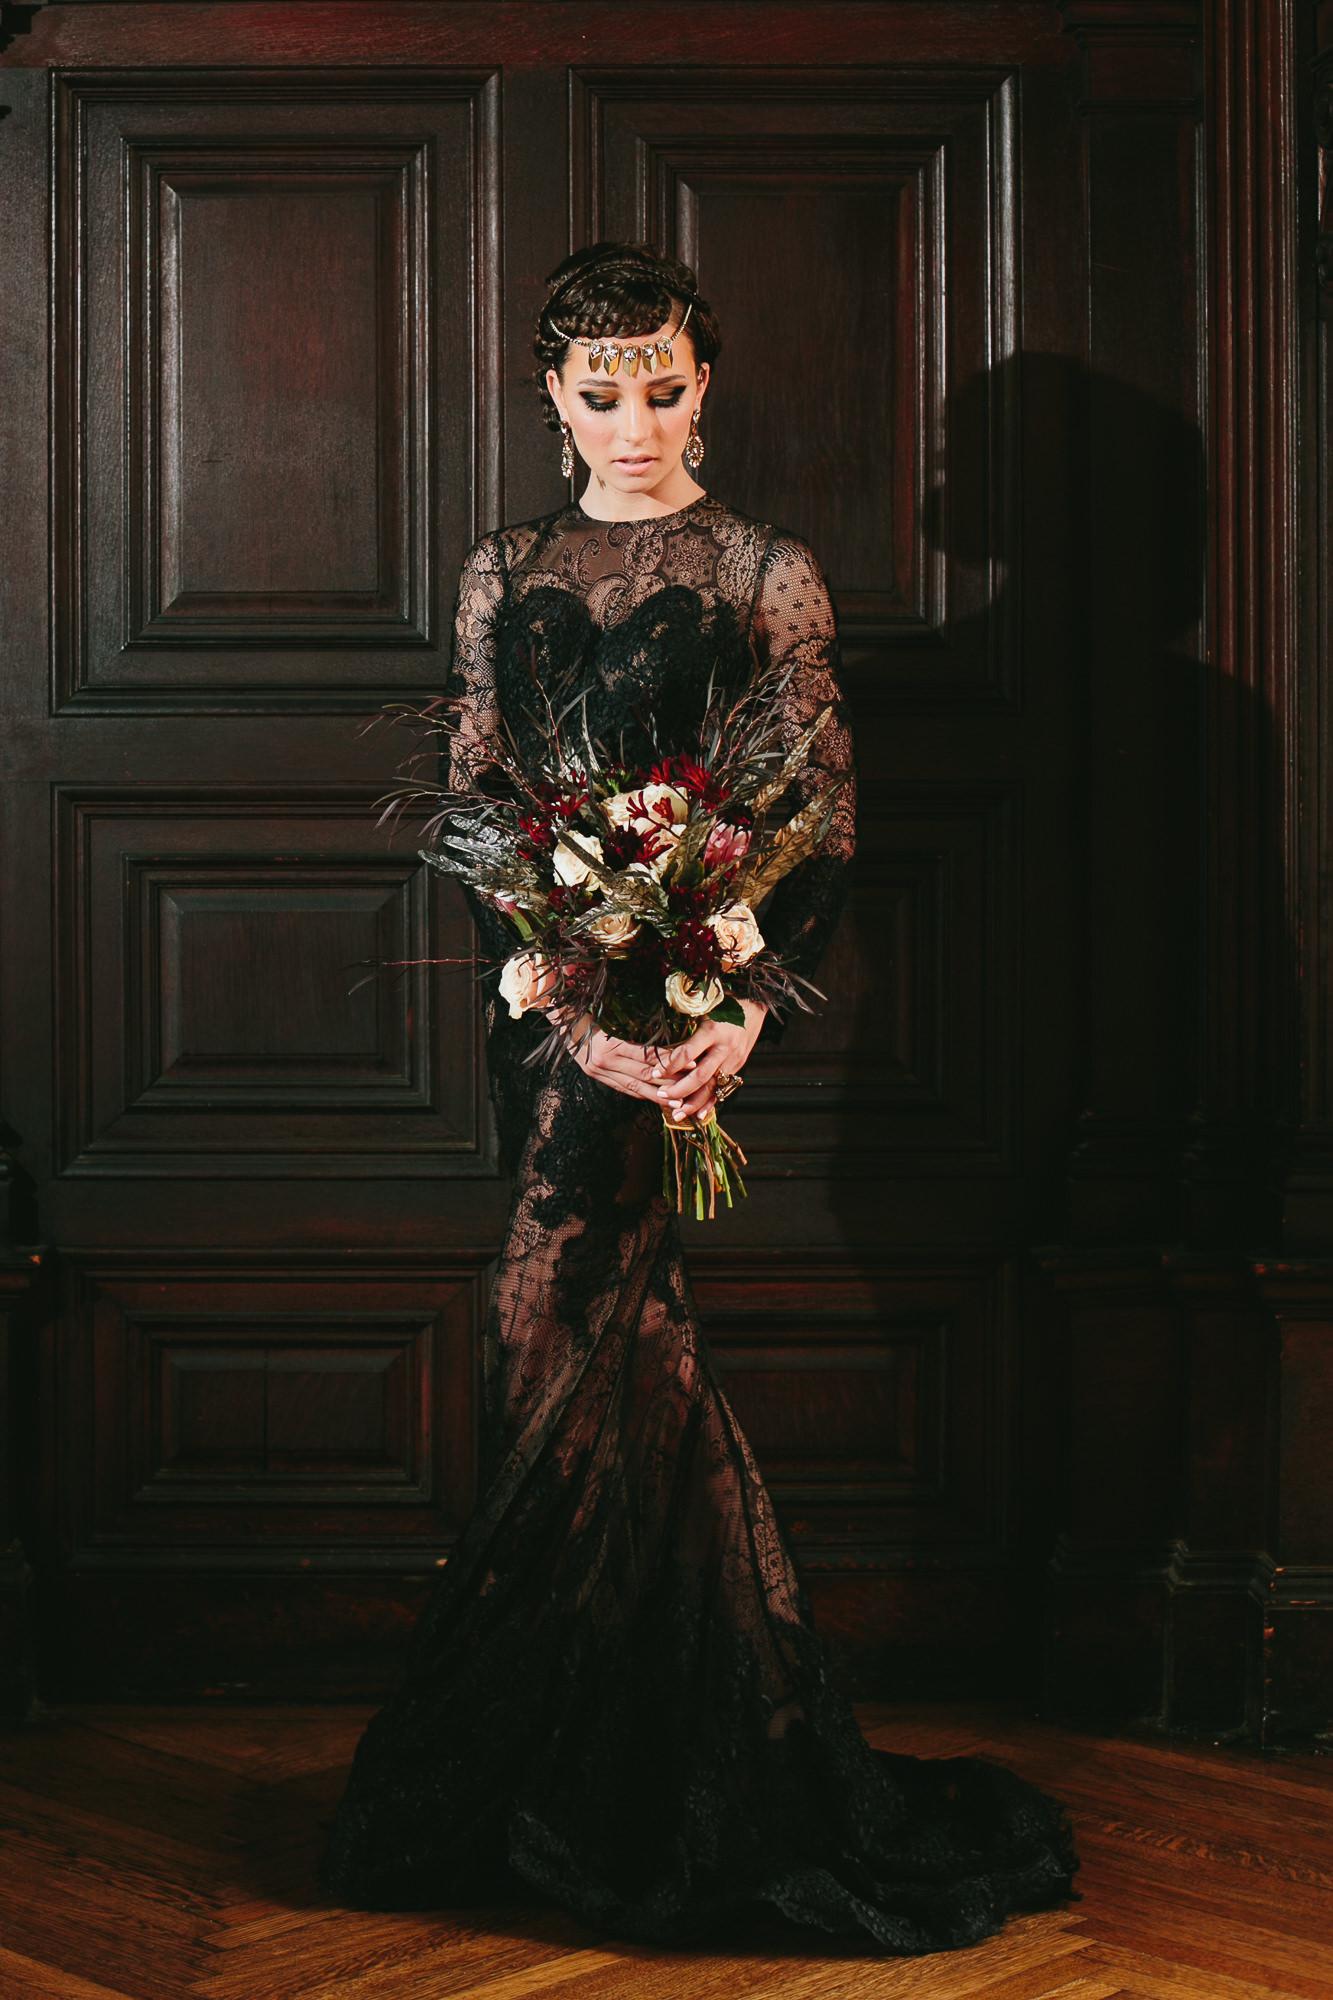 65 Black Lace Wedding Feather Bouquet Highline Hotel NYC.jpg